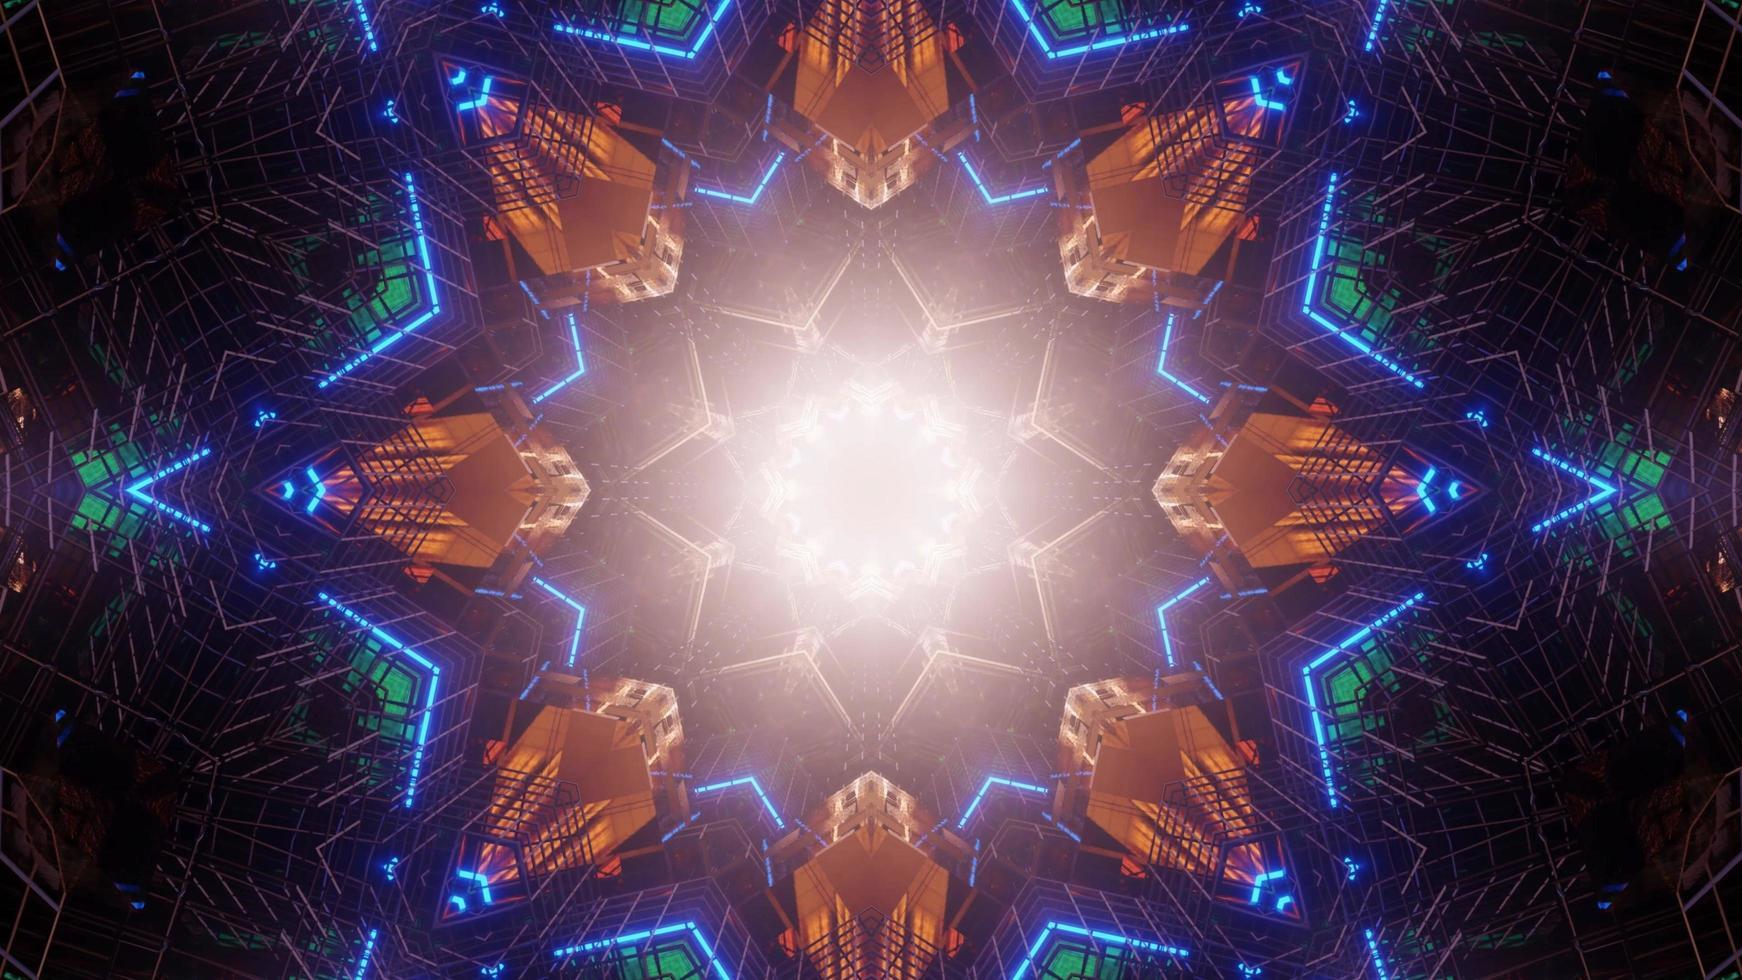 Futuristic sci-fi wallpaper background photo